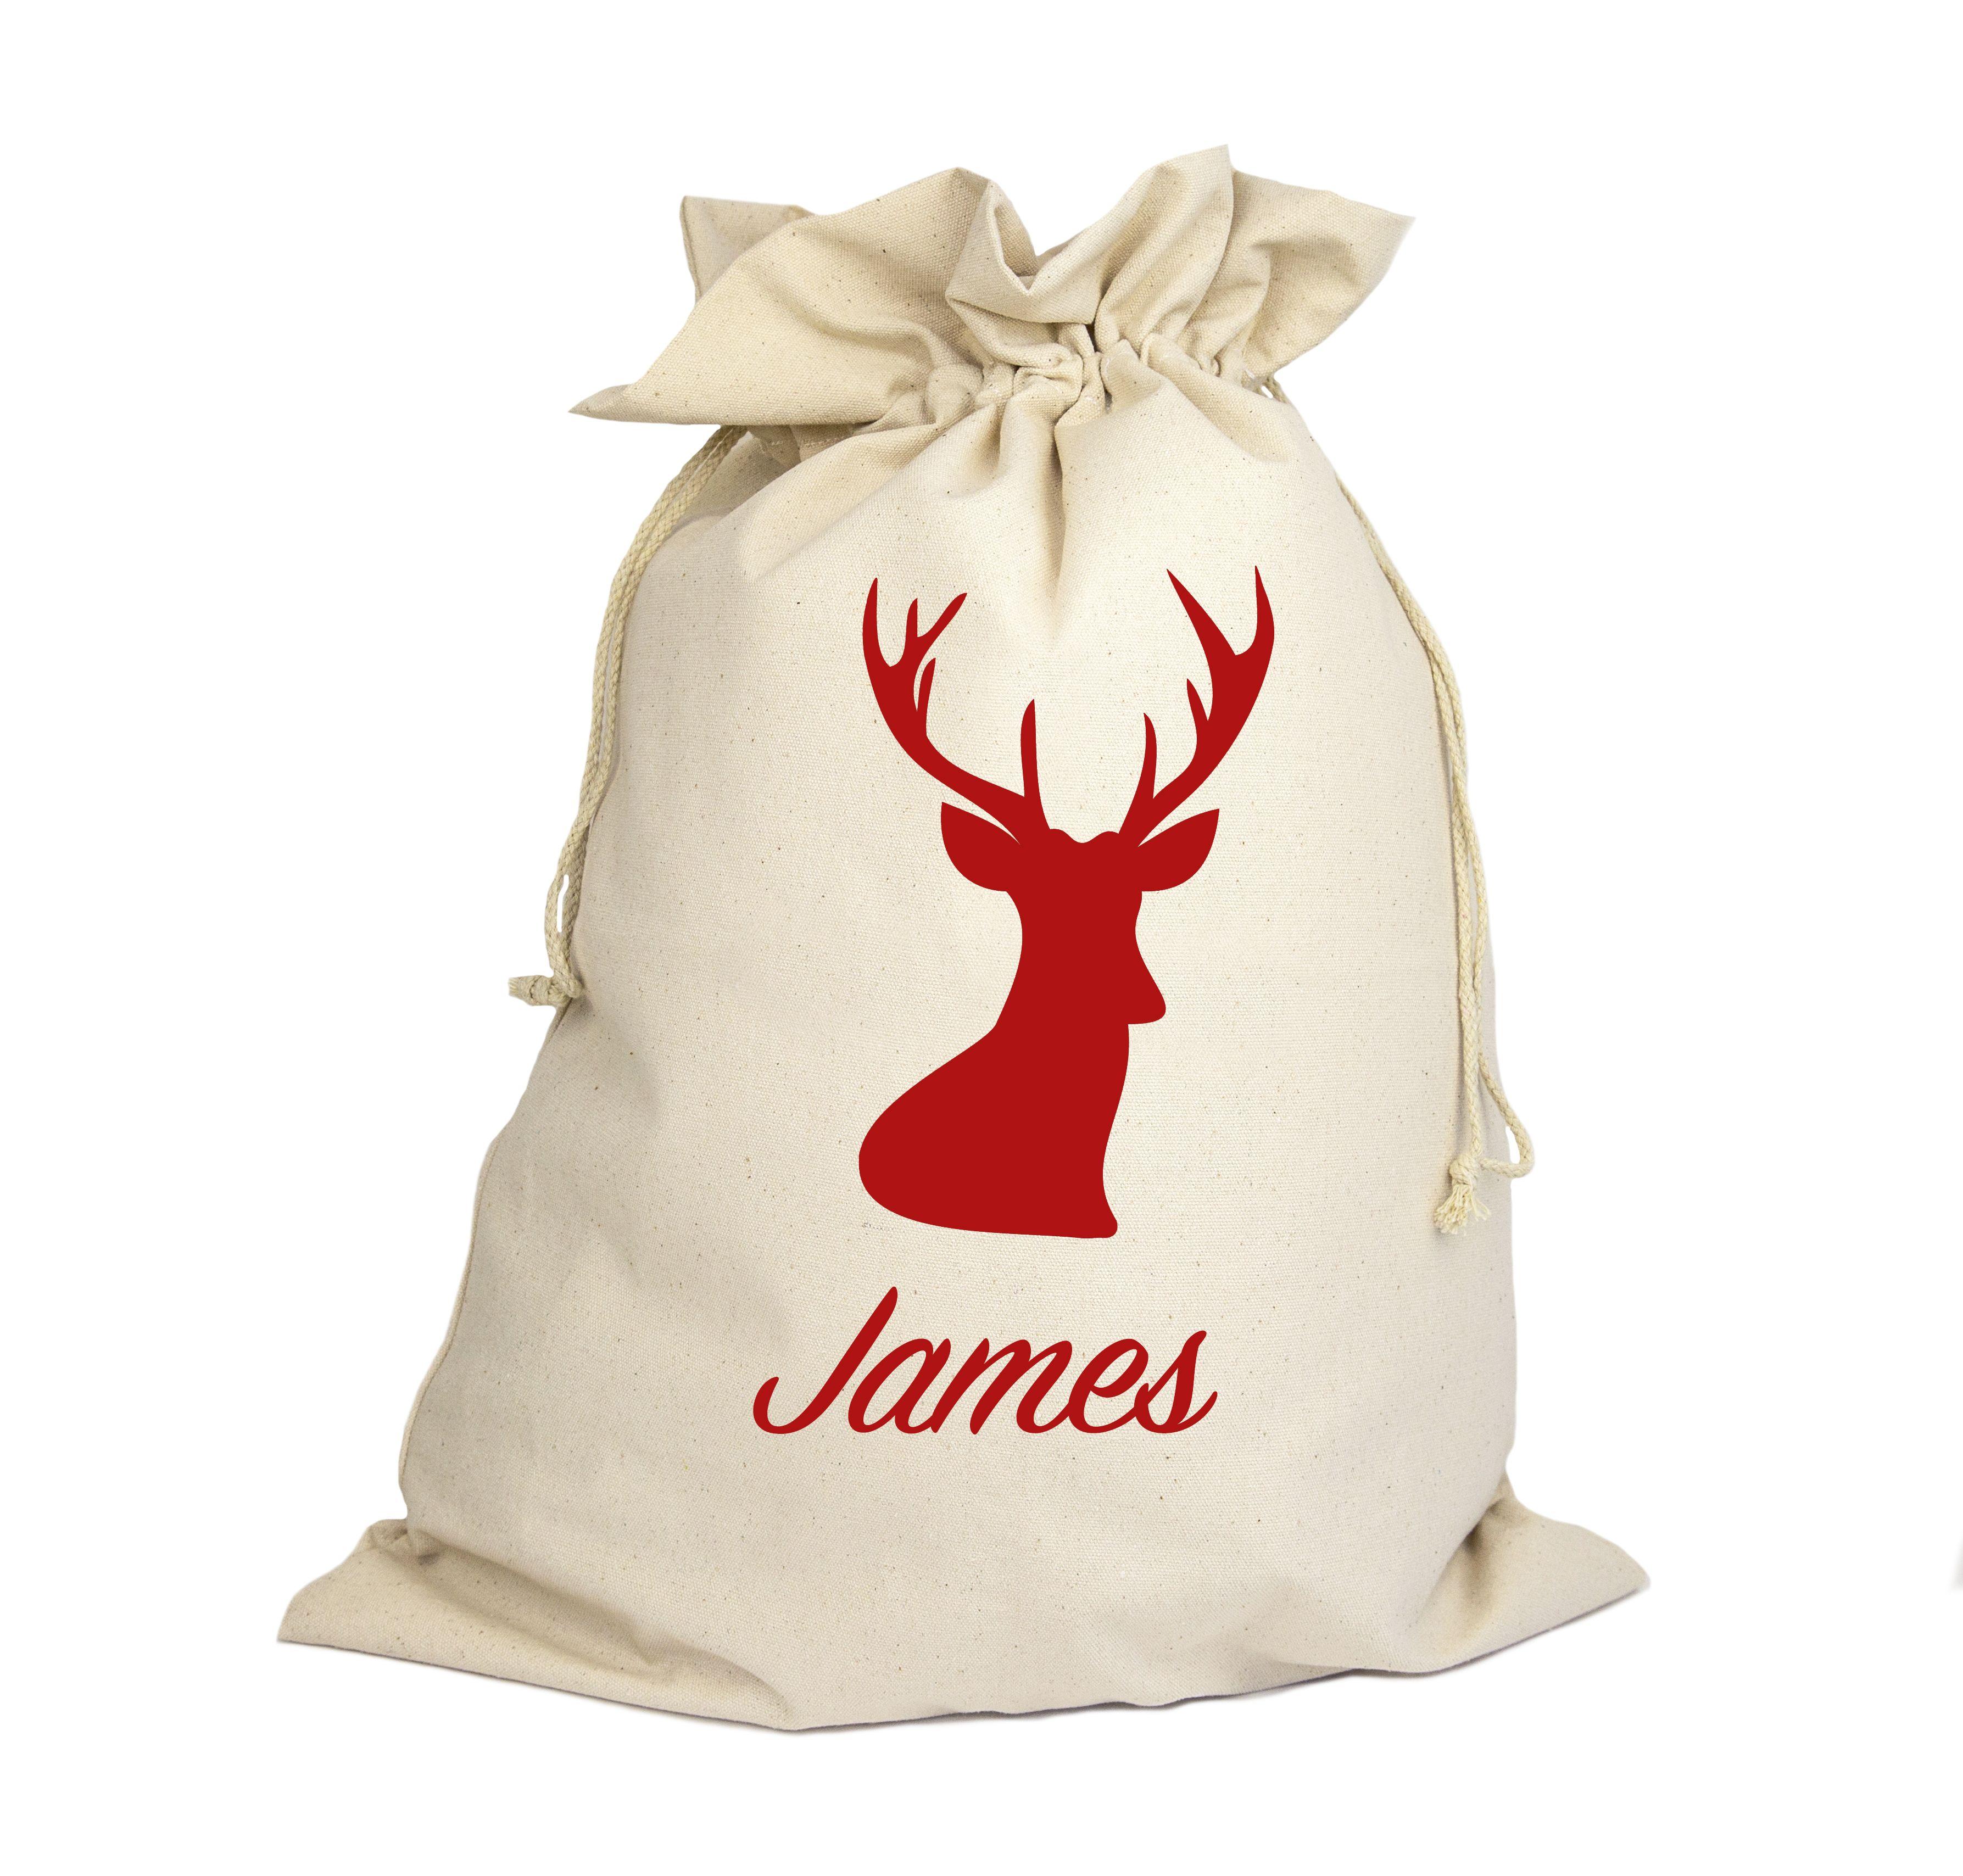 Pet Cushion Cover Personalised santa sacks, Personalized